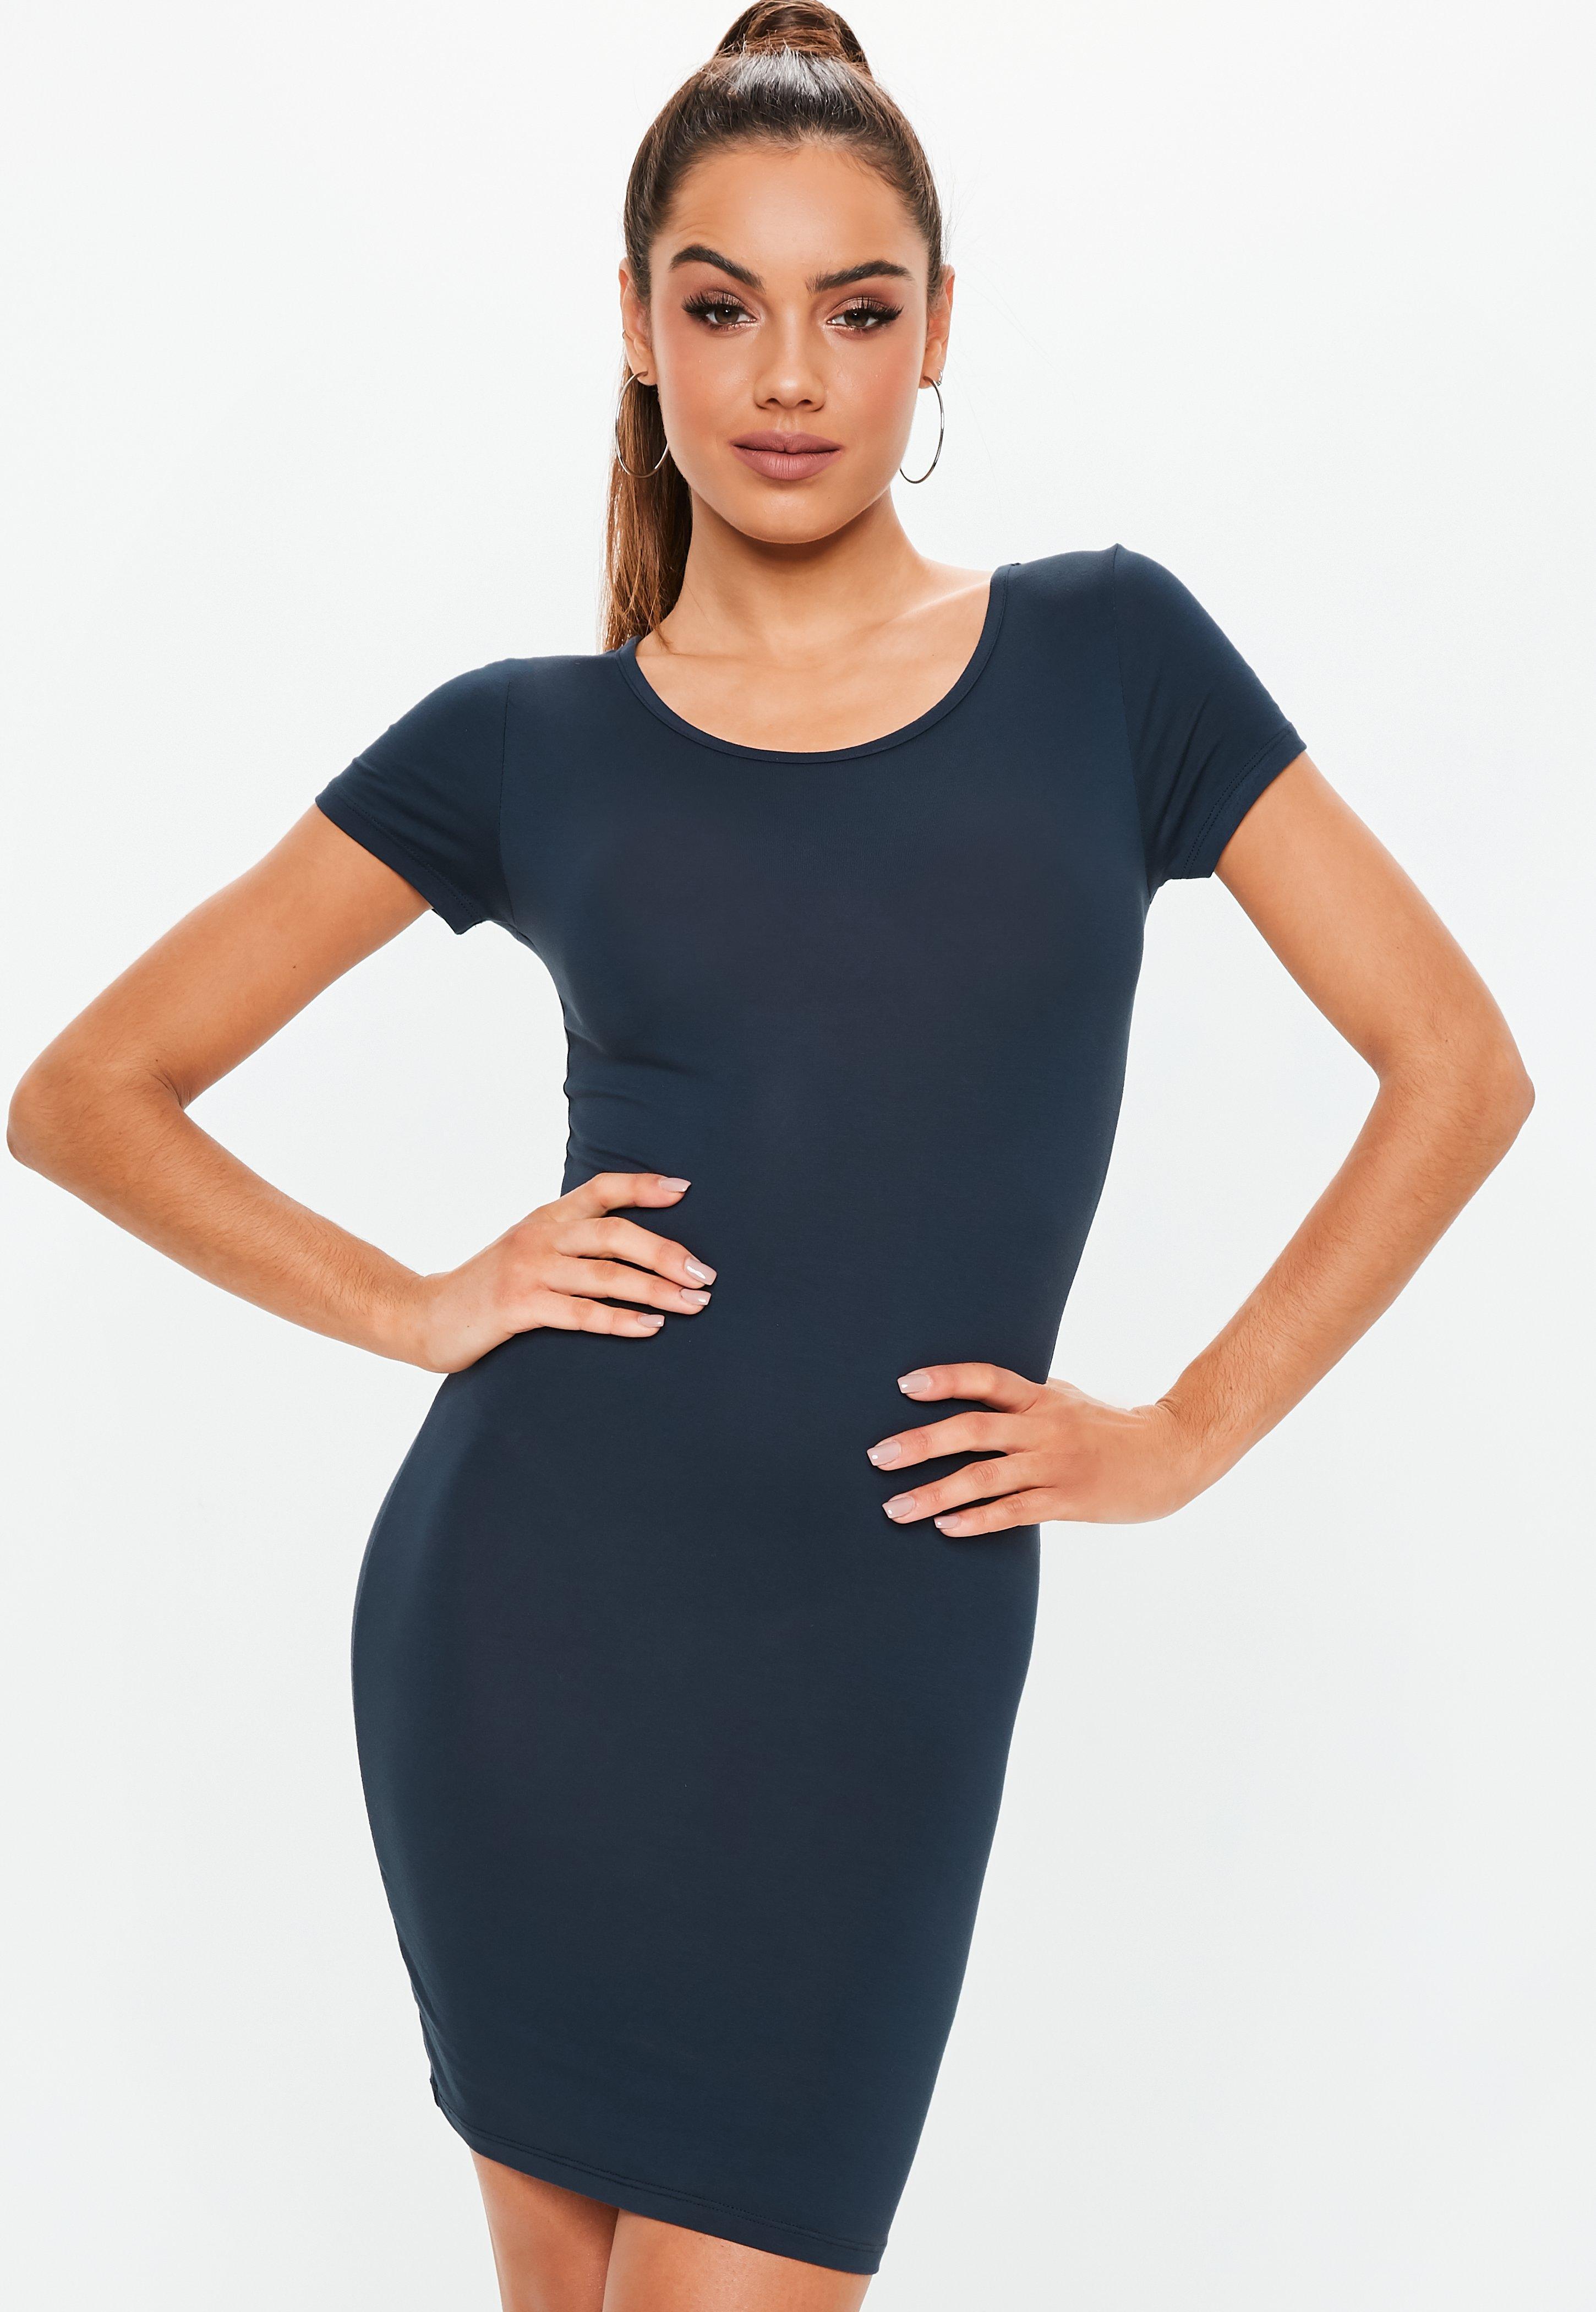 072134855d Navy Short Sleeve Bodycon Dress